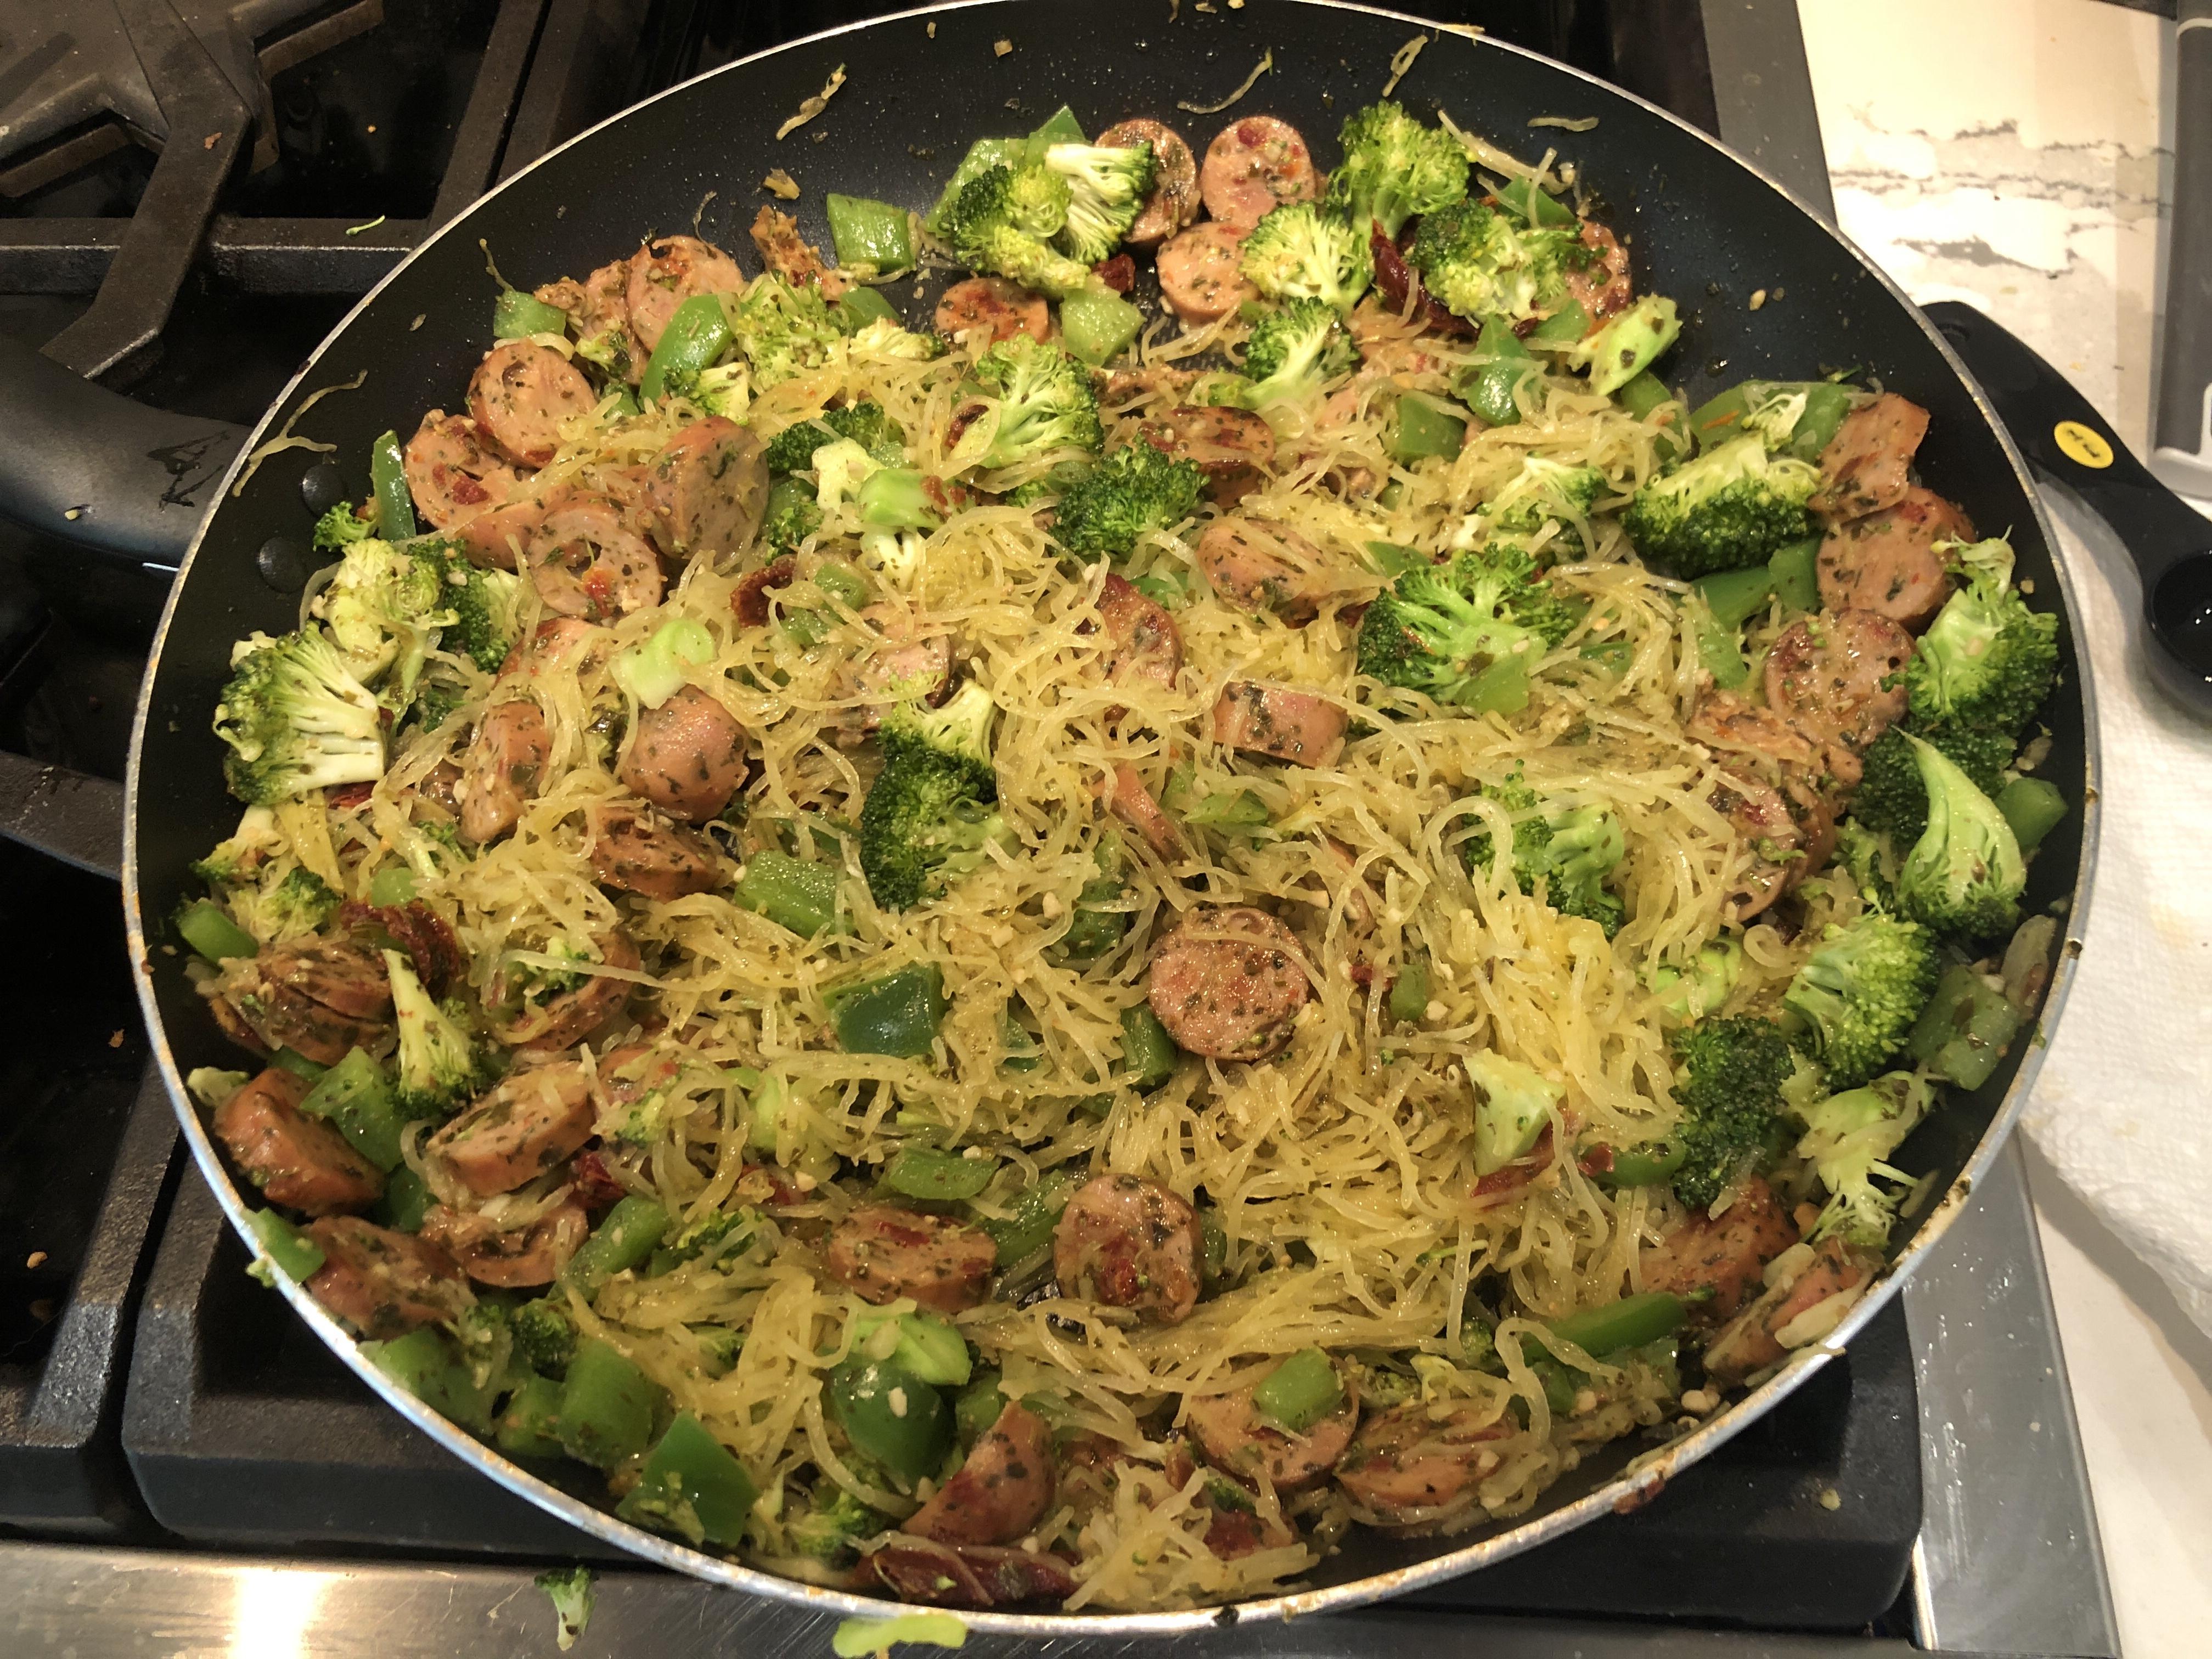 Italian Chicken Pesto with Spaghetti Squash Lisa Scott